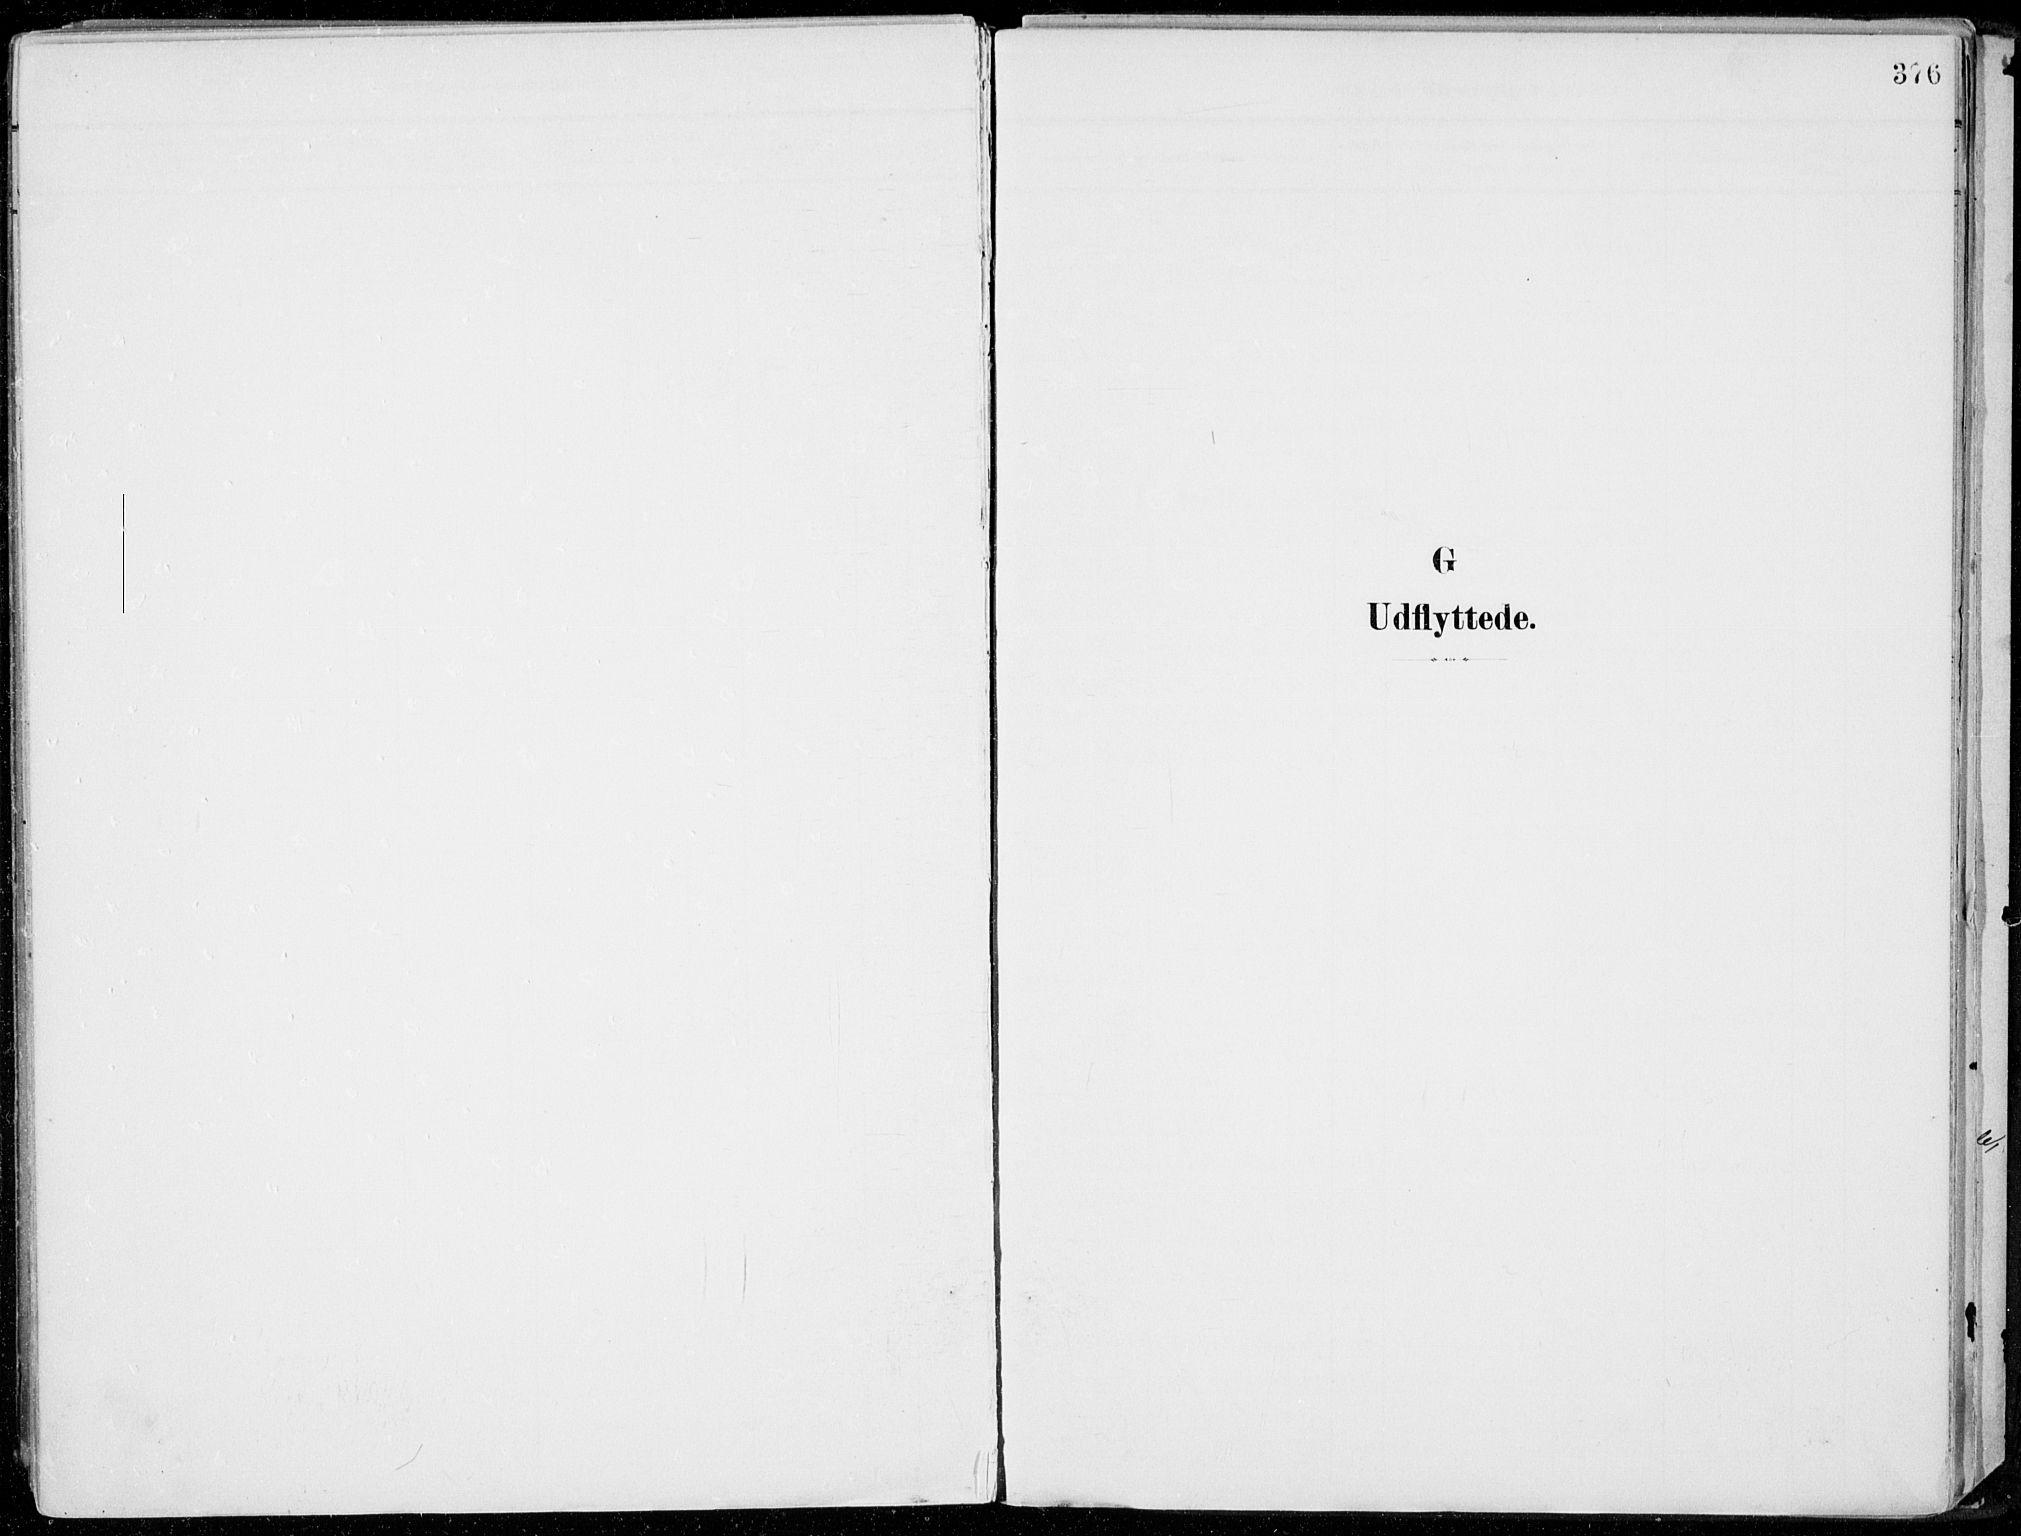 SAH, Lillehammer prestekontor, Ministerialbok nr. 1, 1901-1916, s. 376